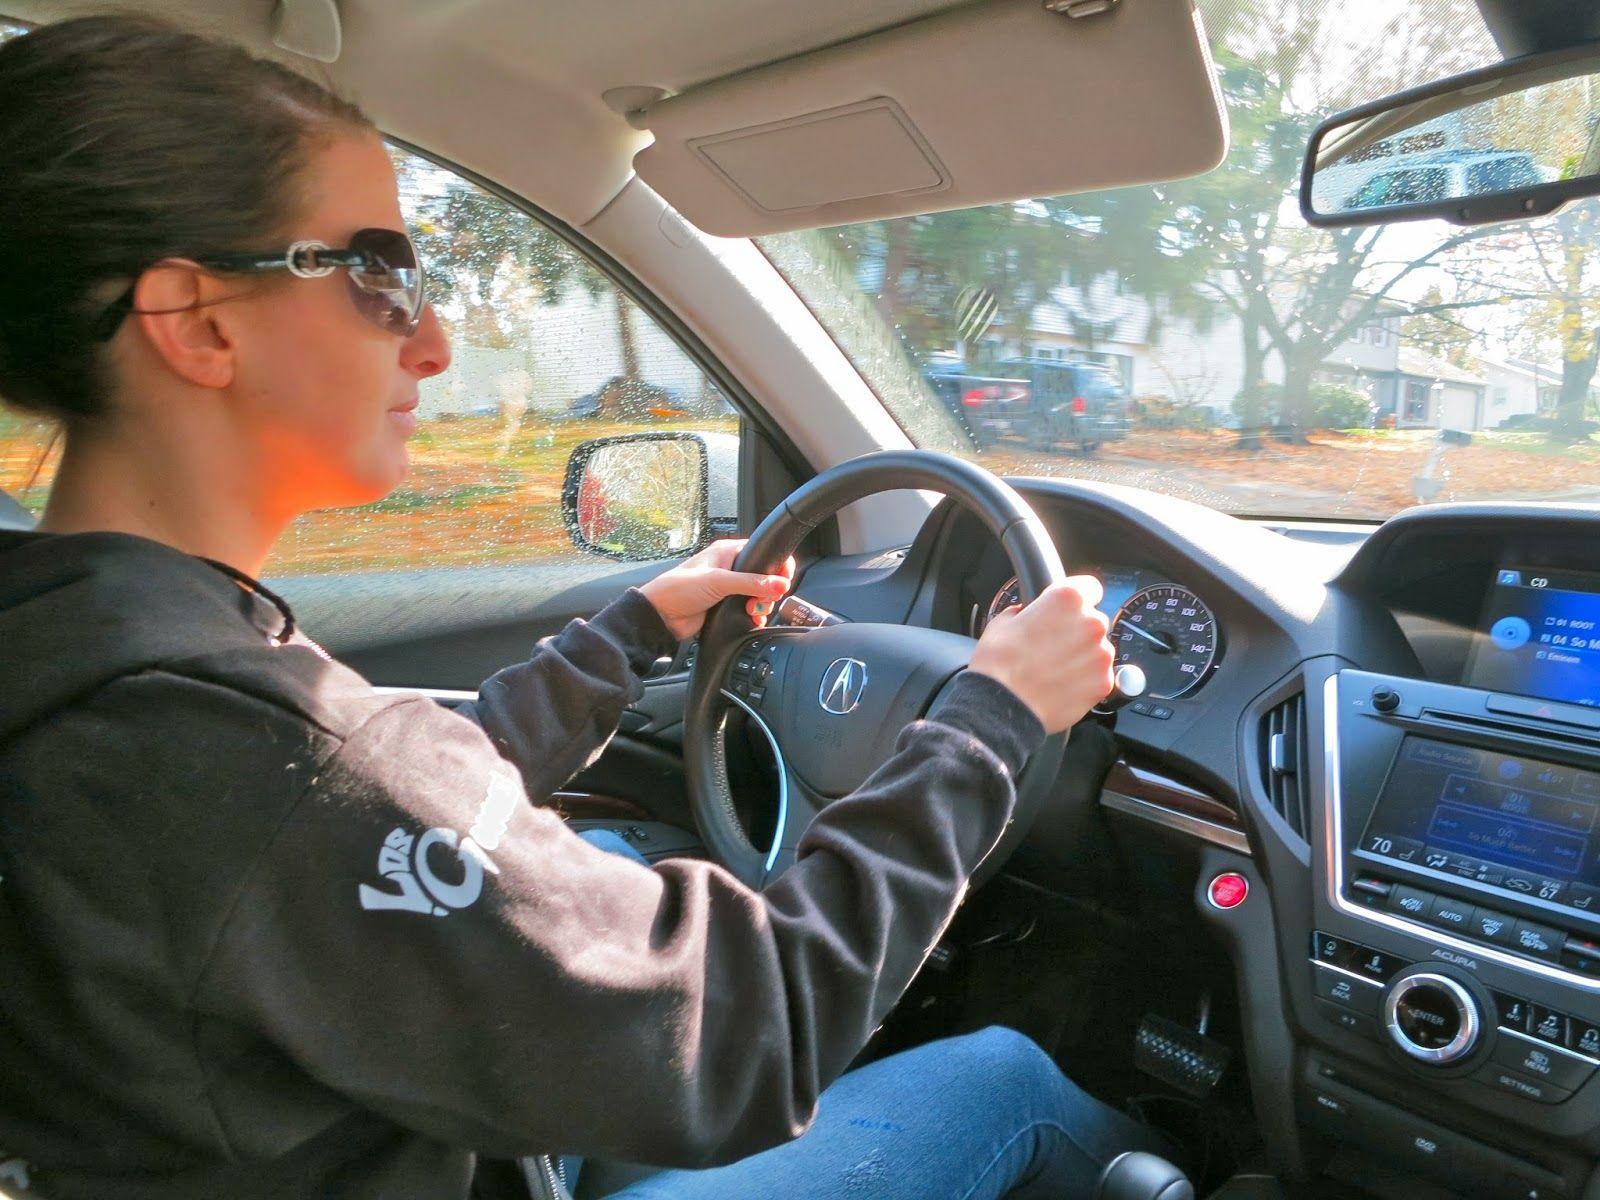 Cars 2014 acura acura mdx acura mdx driving acura mdx exterior acura